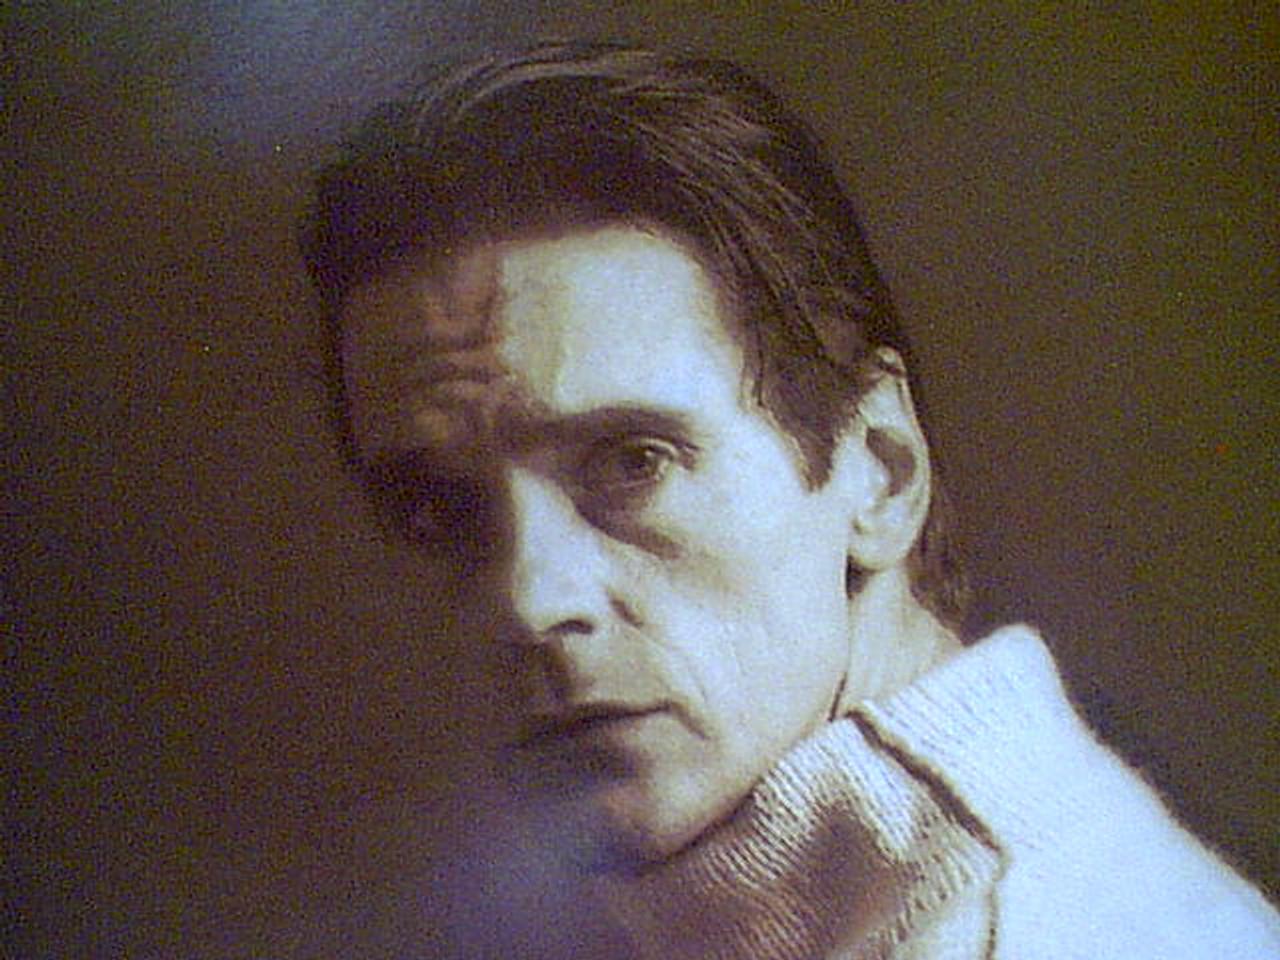 Irons, Jeremy Color Photo Signed Autograph